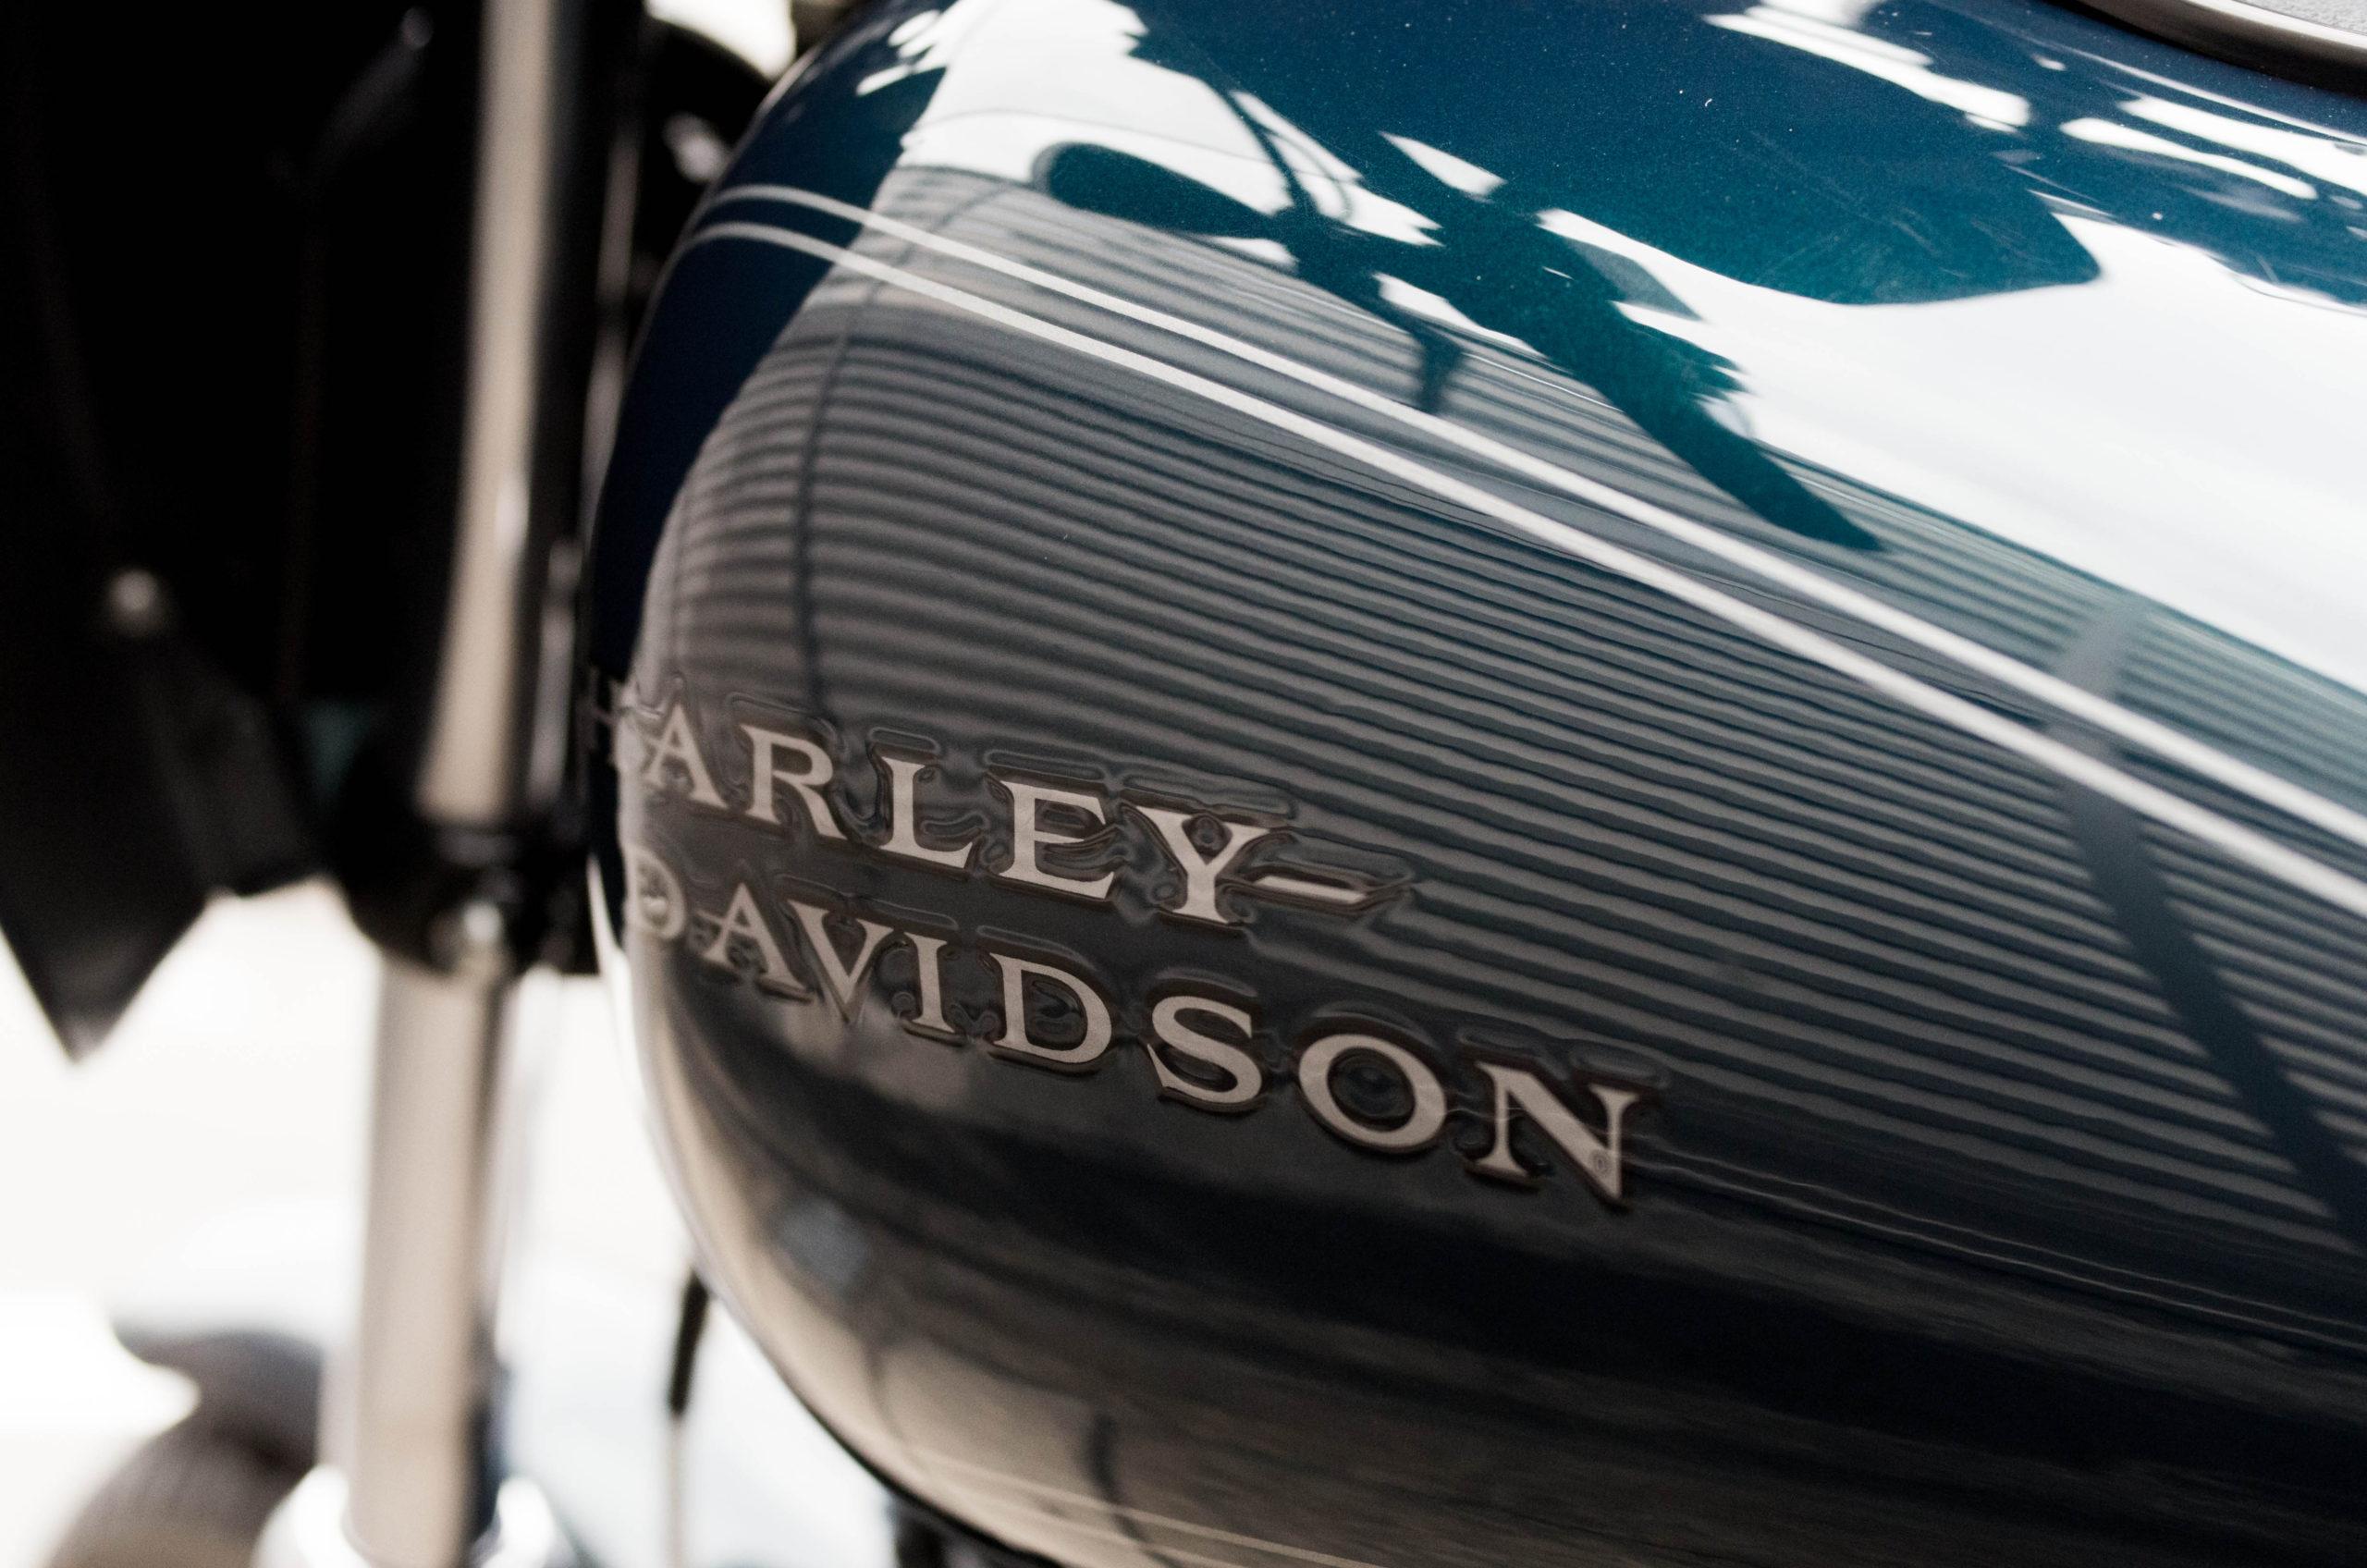 Harley Davidson FXDXT T-Sport